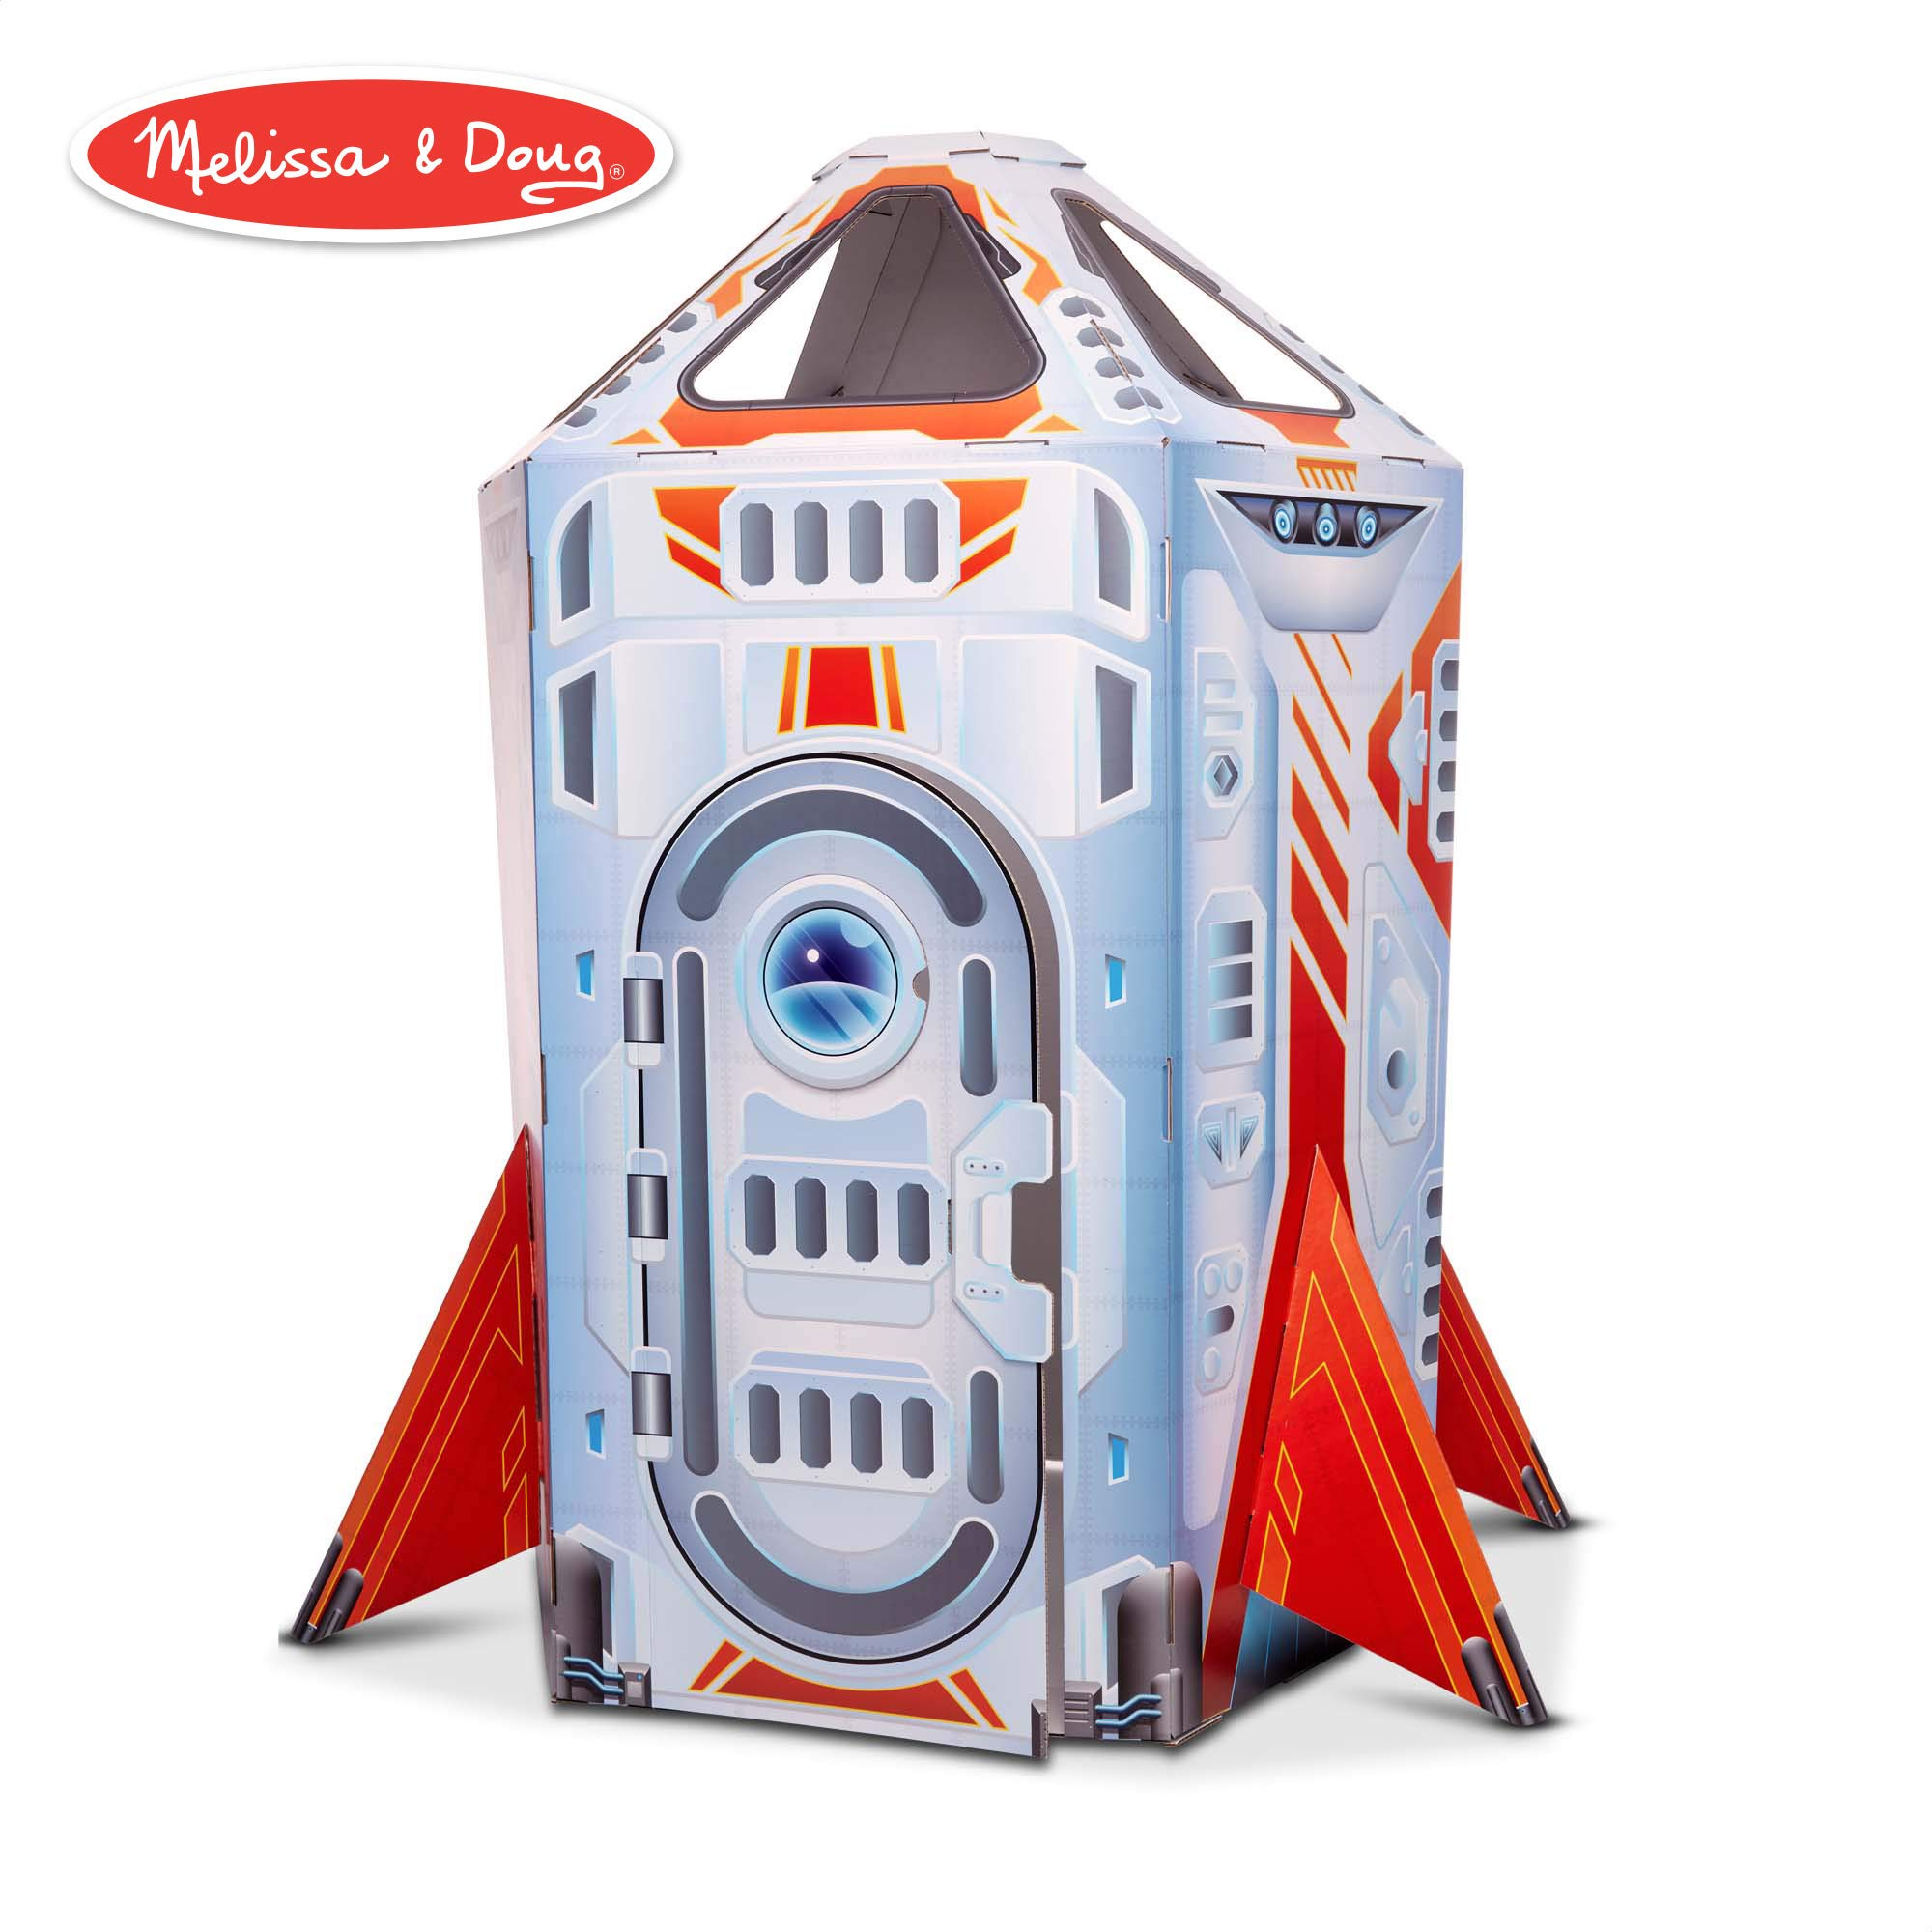 Melissa & Doug Rocket Ship Indoor Corrugate Playhouse (Over 4' Tall) by Melissa & Doug